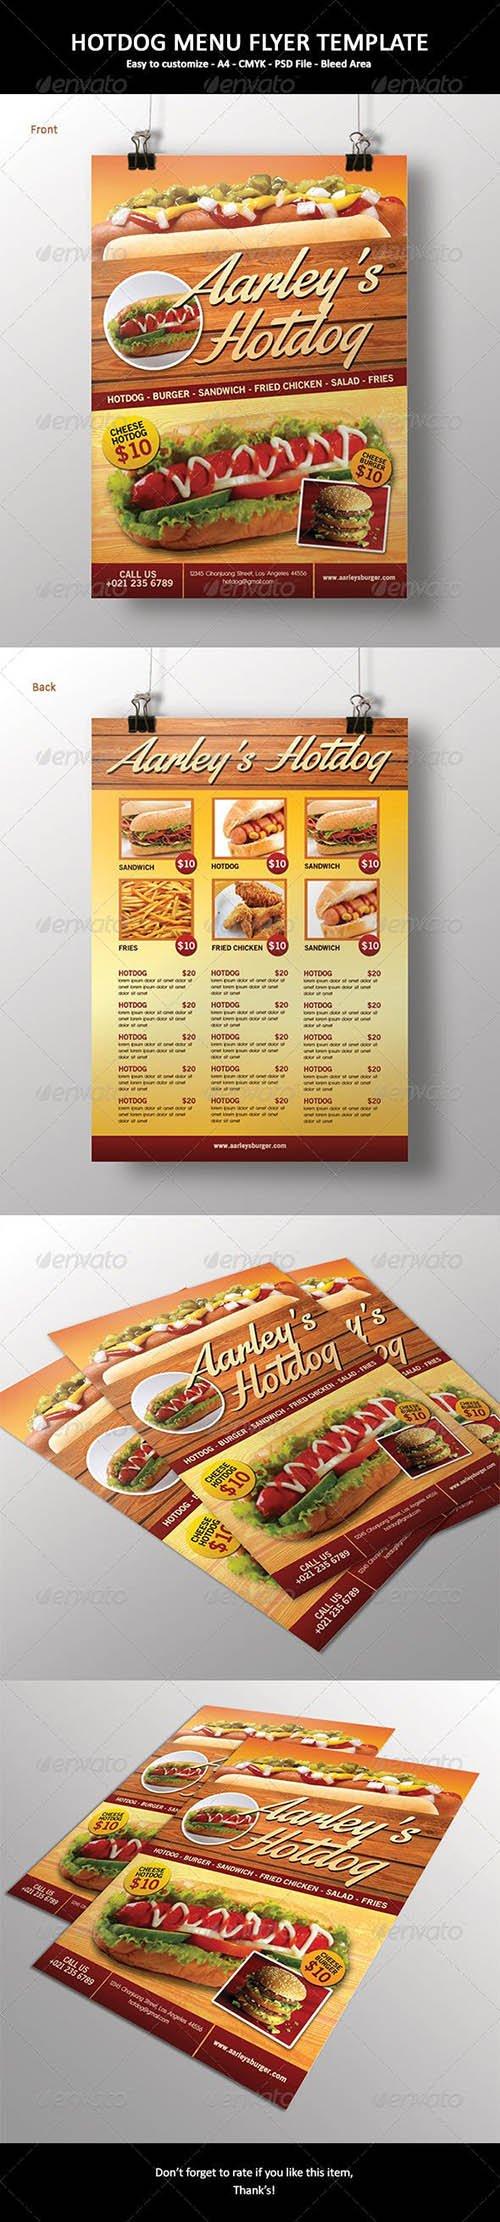 GR - Hotdog Menu Flyer 6529533